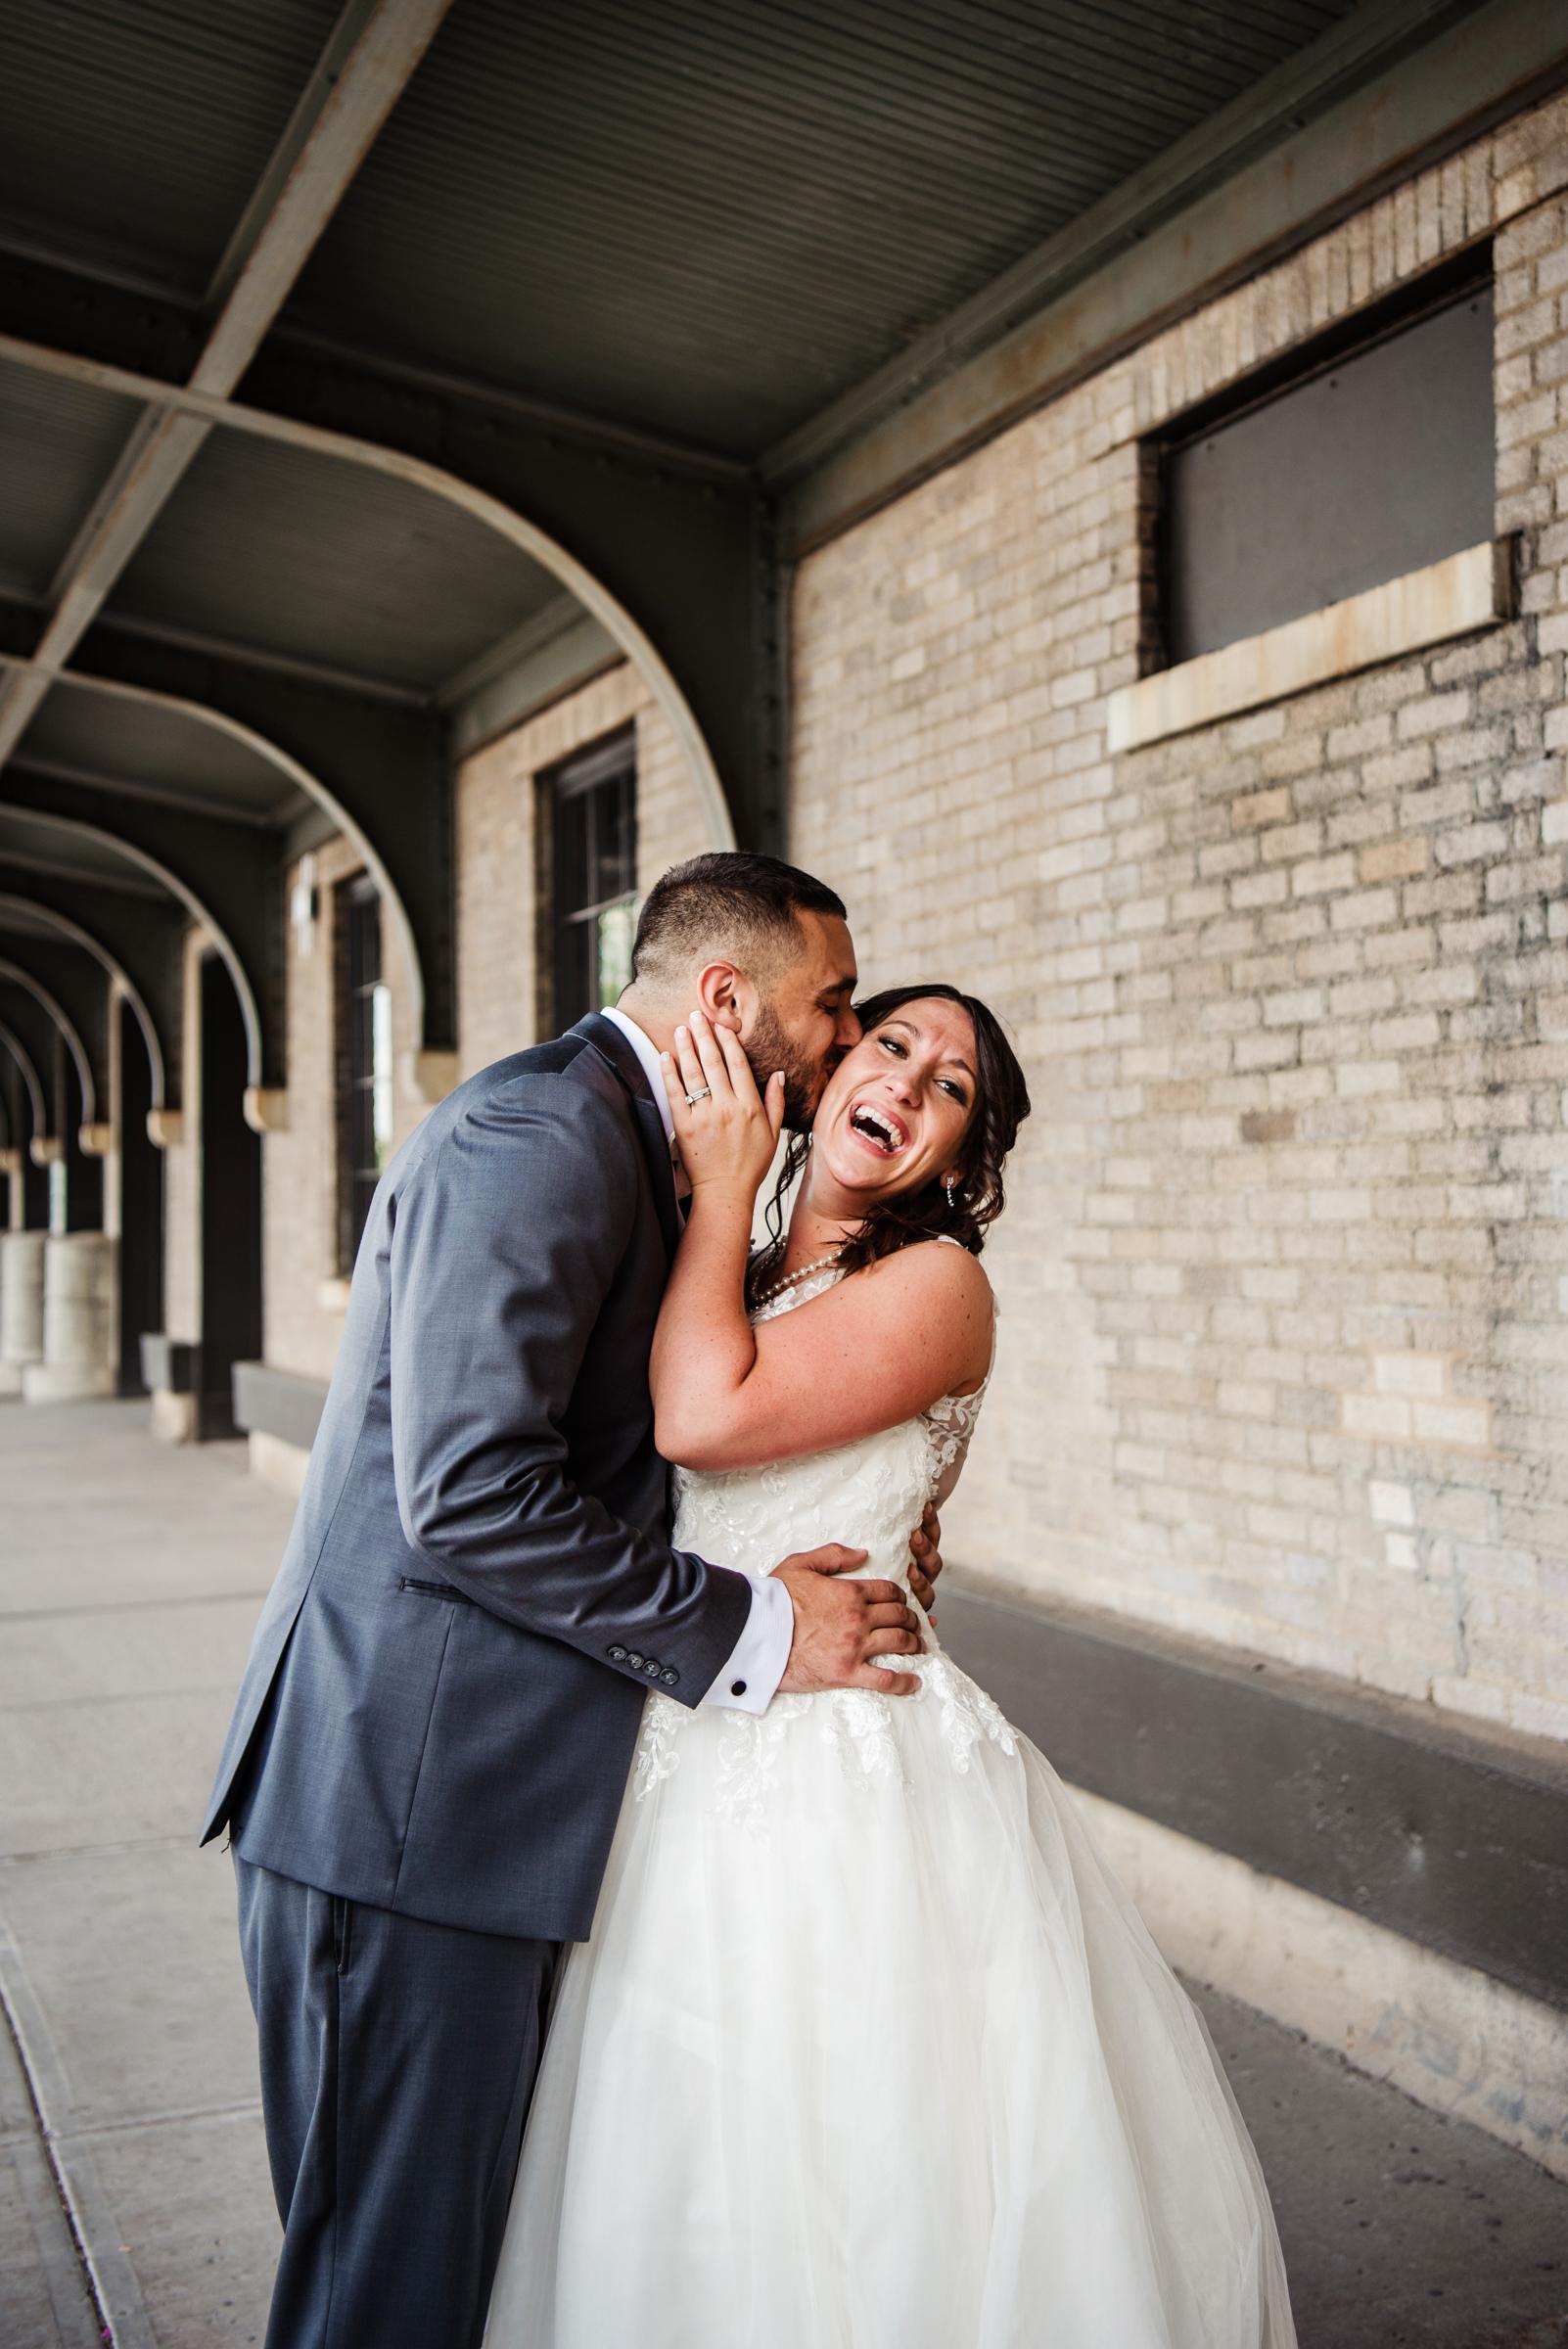 Historic_Old_St_Johns_Church_Valentinos_Banquet_Hall_Central_NY_Wedding_JILL_STUDIO_Rochester_NY_Photographer_DSC_6357.jpg